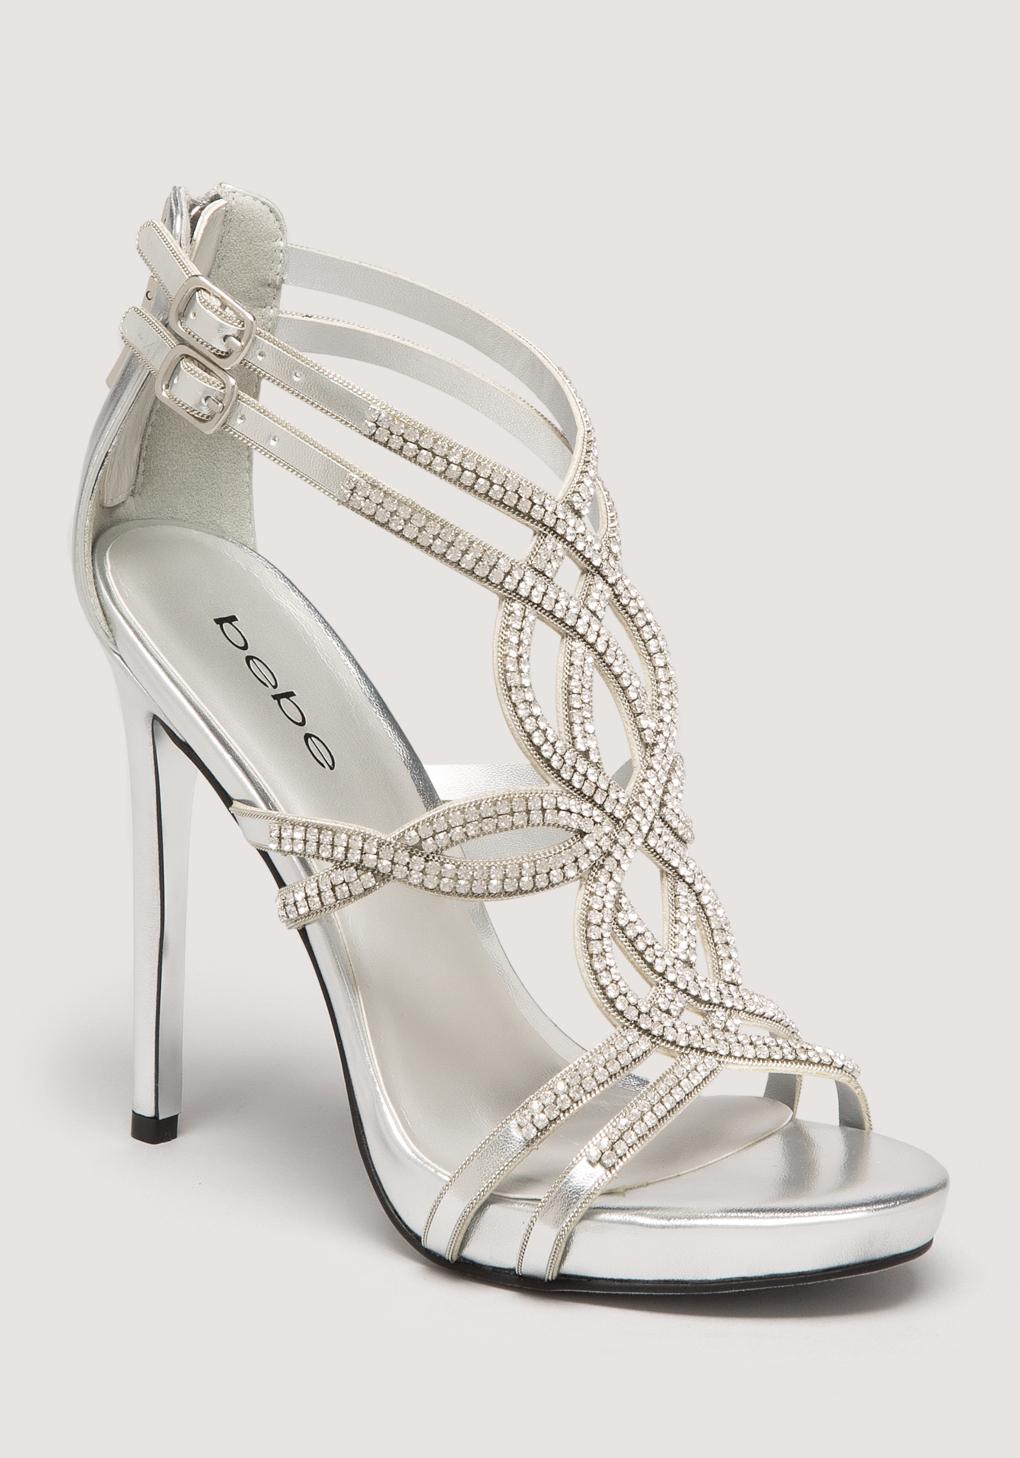 bee944355e8 Bebe Tamia Jewel Strappy Sandals in Metallic - Lyst